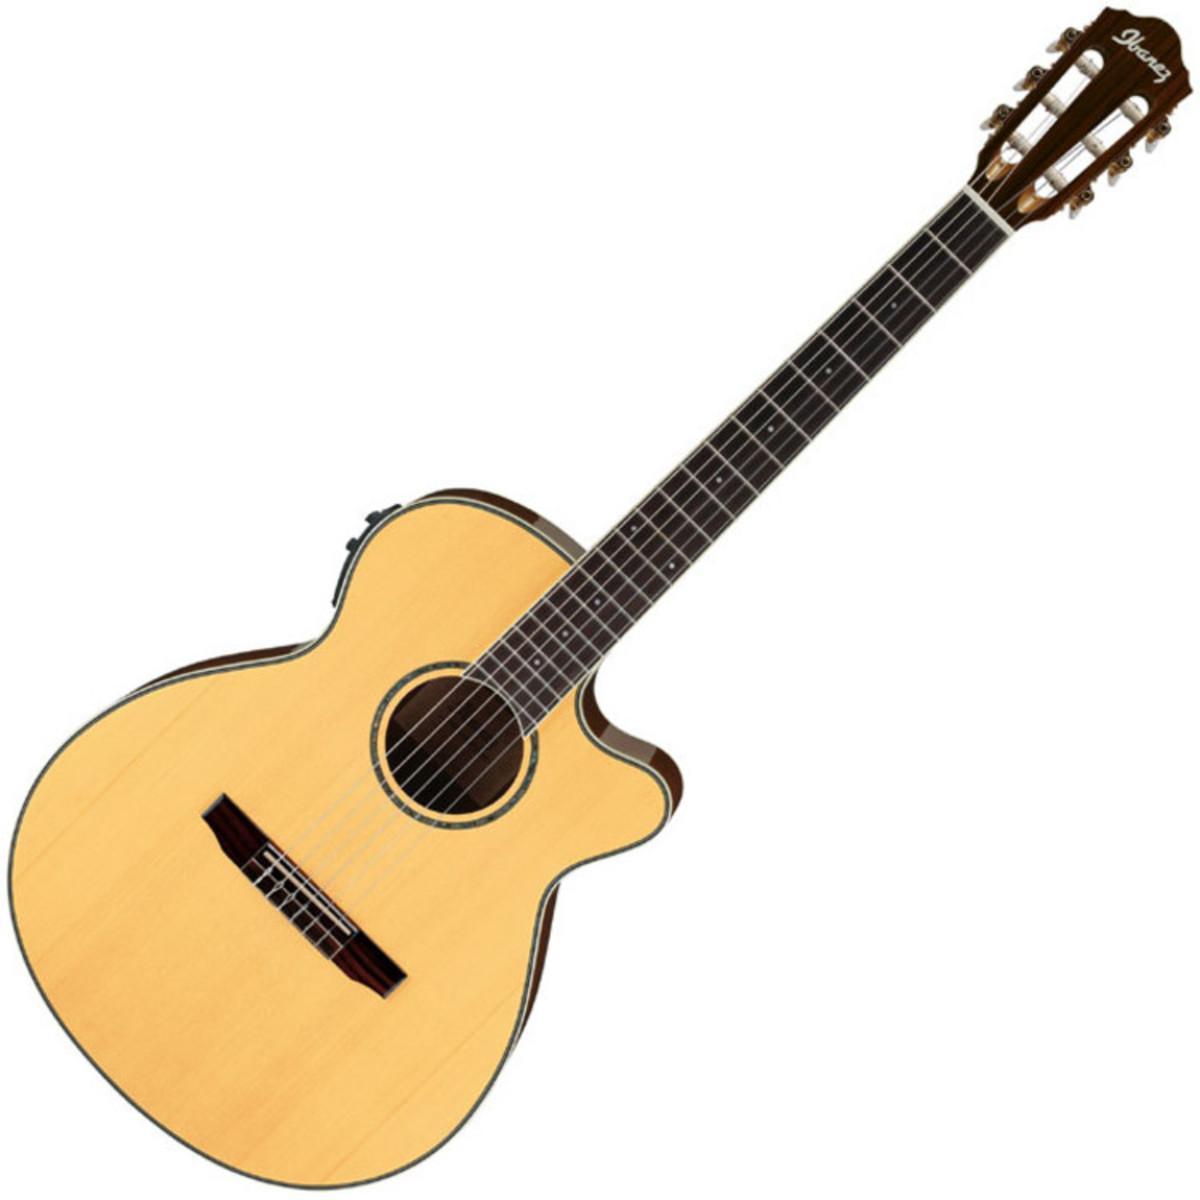 guitare electro acoustique ibanez aeg10nii naturelles. Black Bedroom Furniture Sets. Home Design Ideas